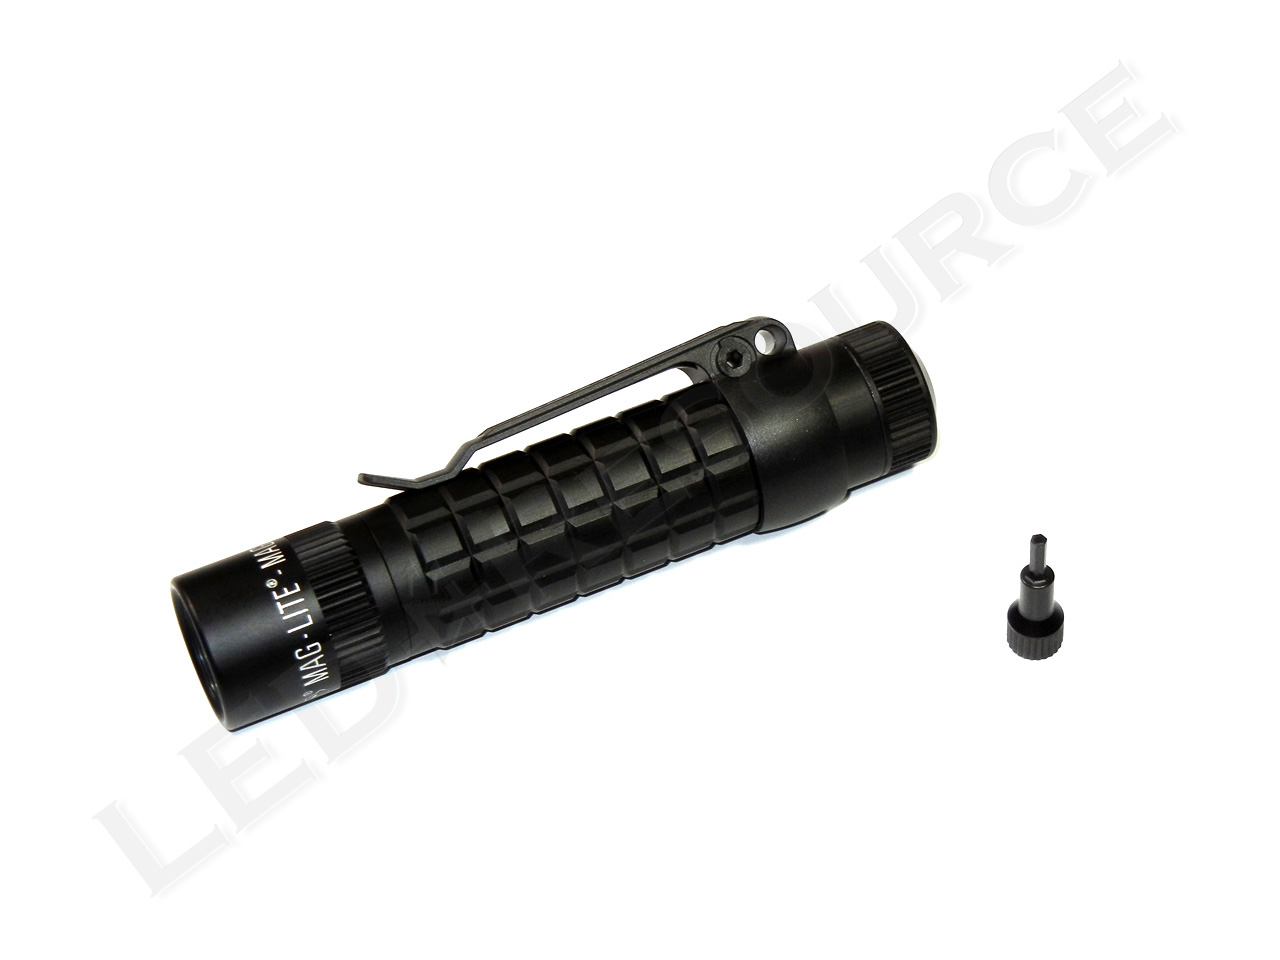 Maglite MAG-TAC LED Flashlight Review